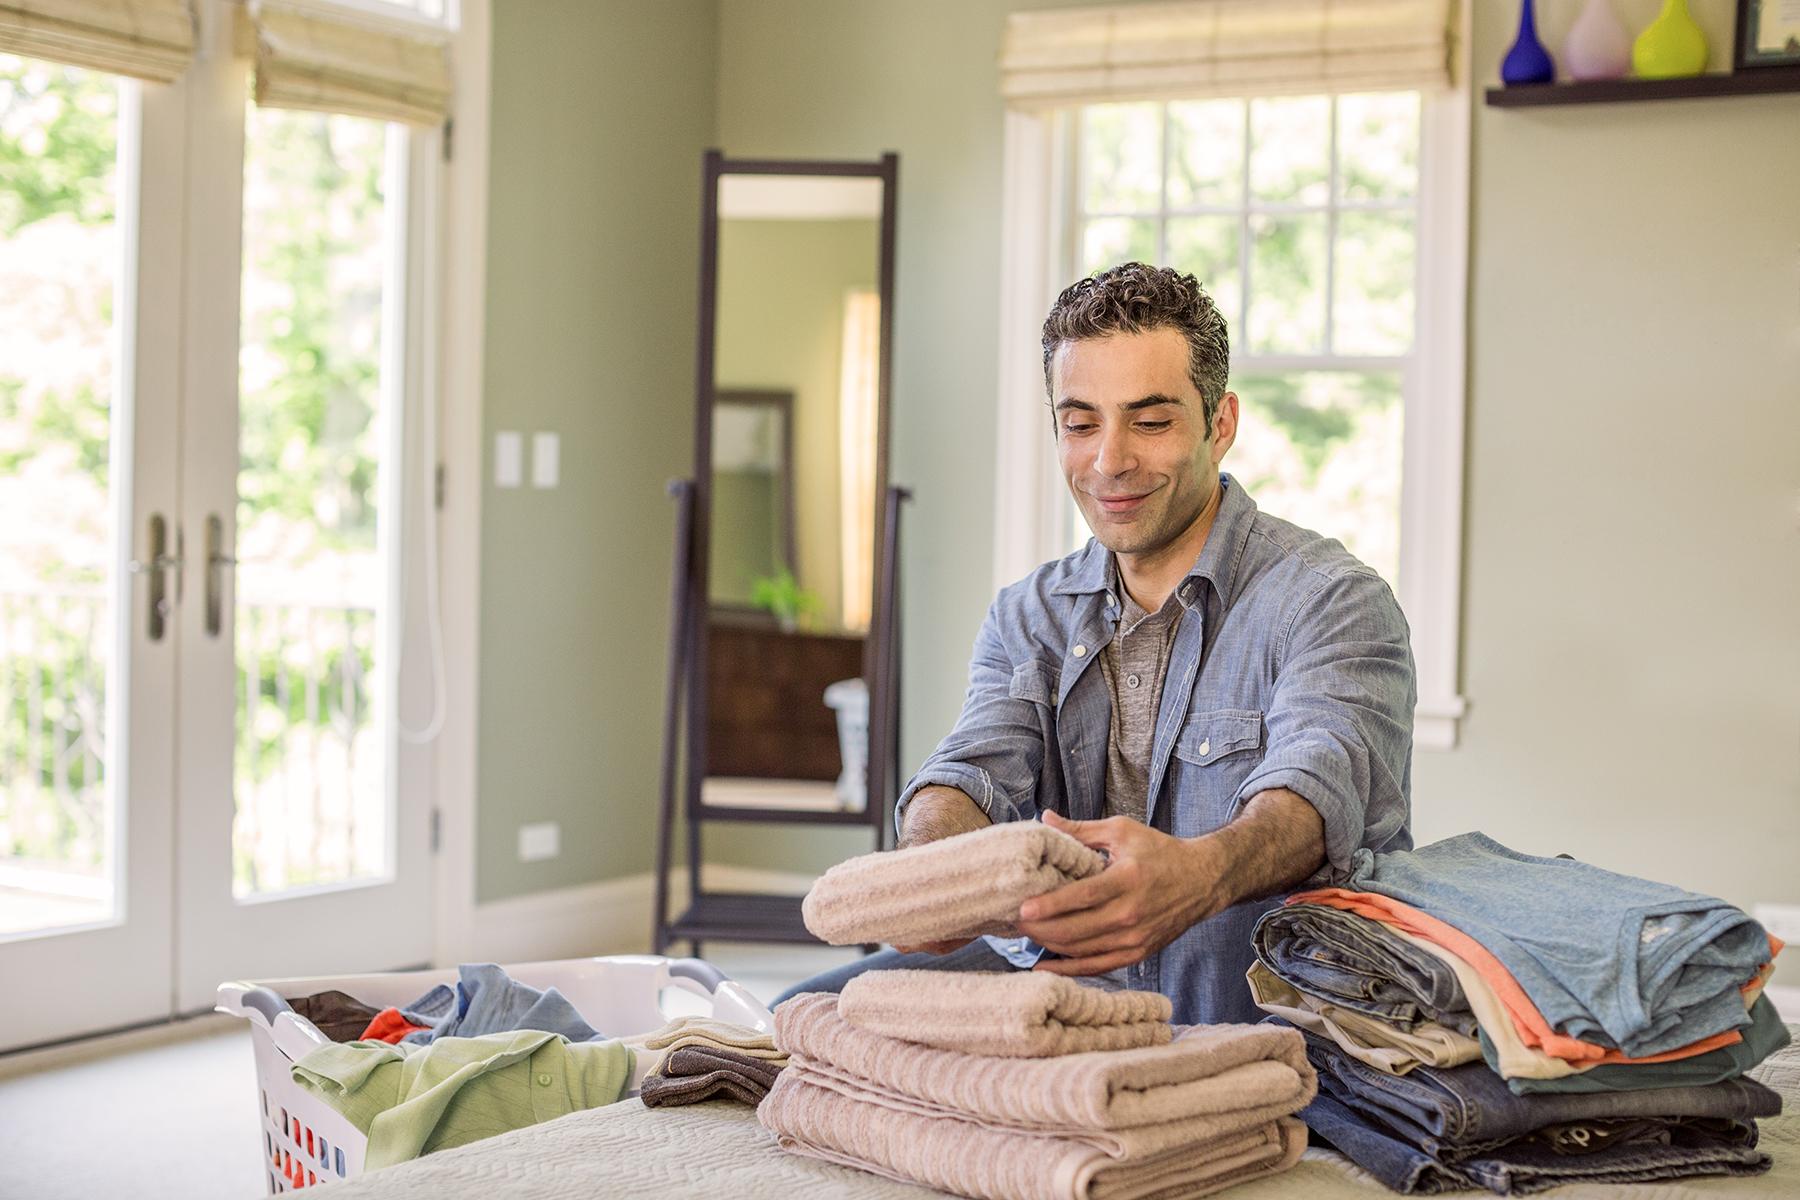 Man-Folding-Laundry-95_r1.jpg